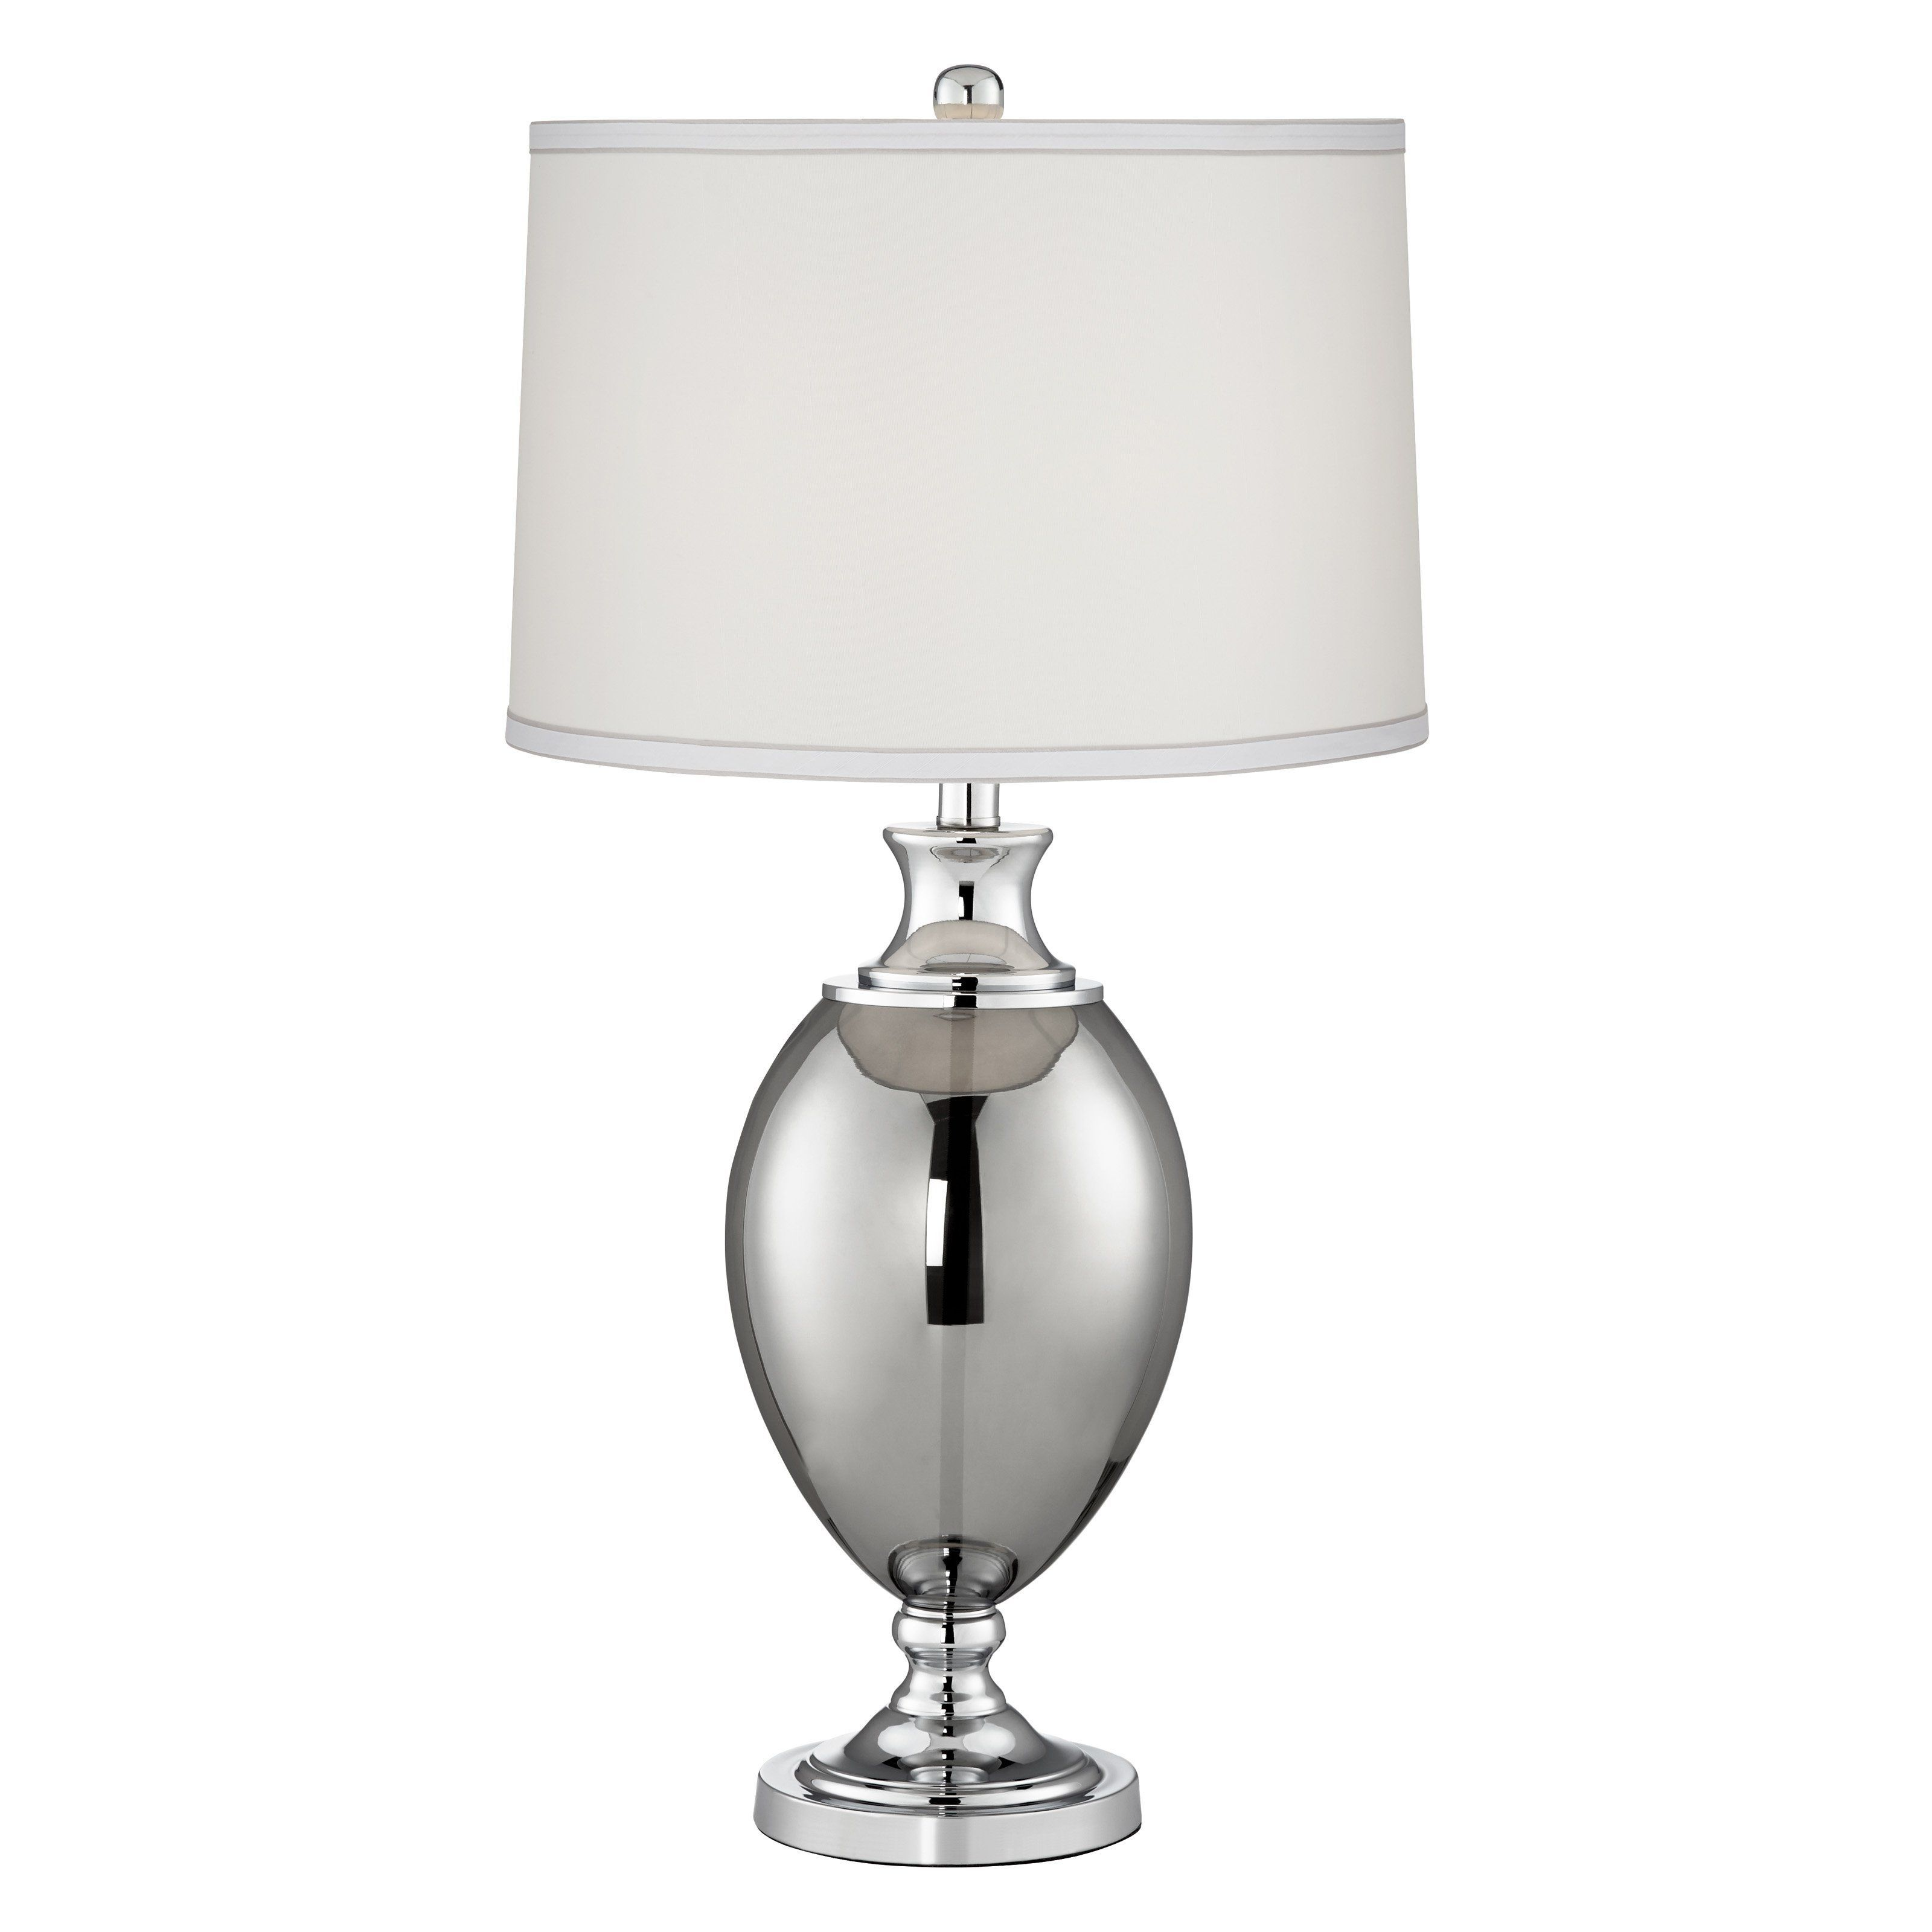 Pacific Coast Lighting Raylee Table Lamp 14f76 Lamp Glass Table Lamp Table Lamp